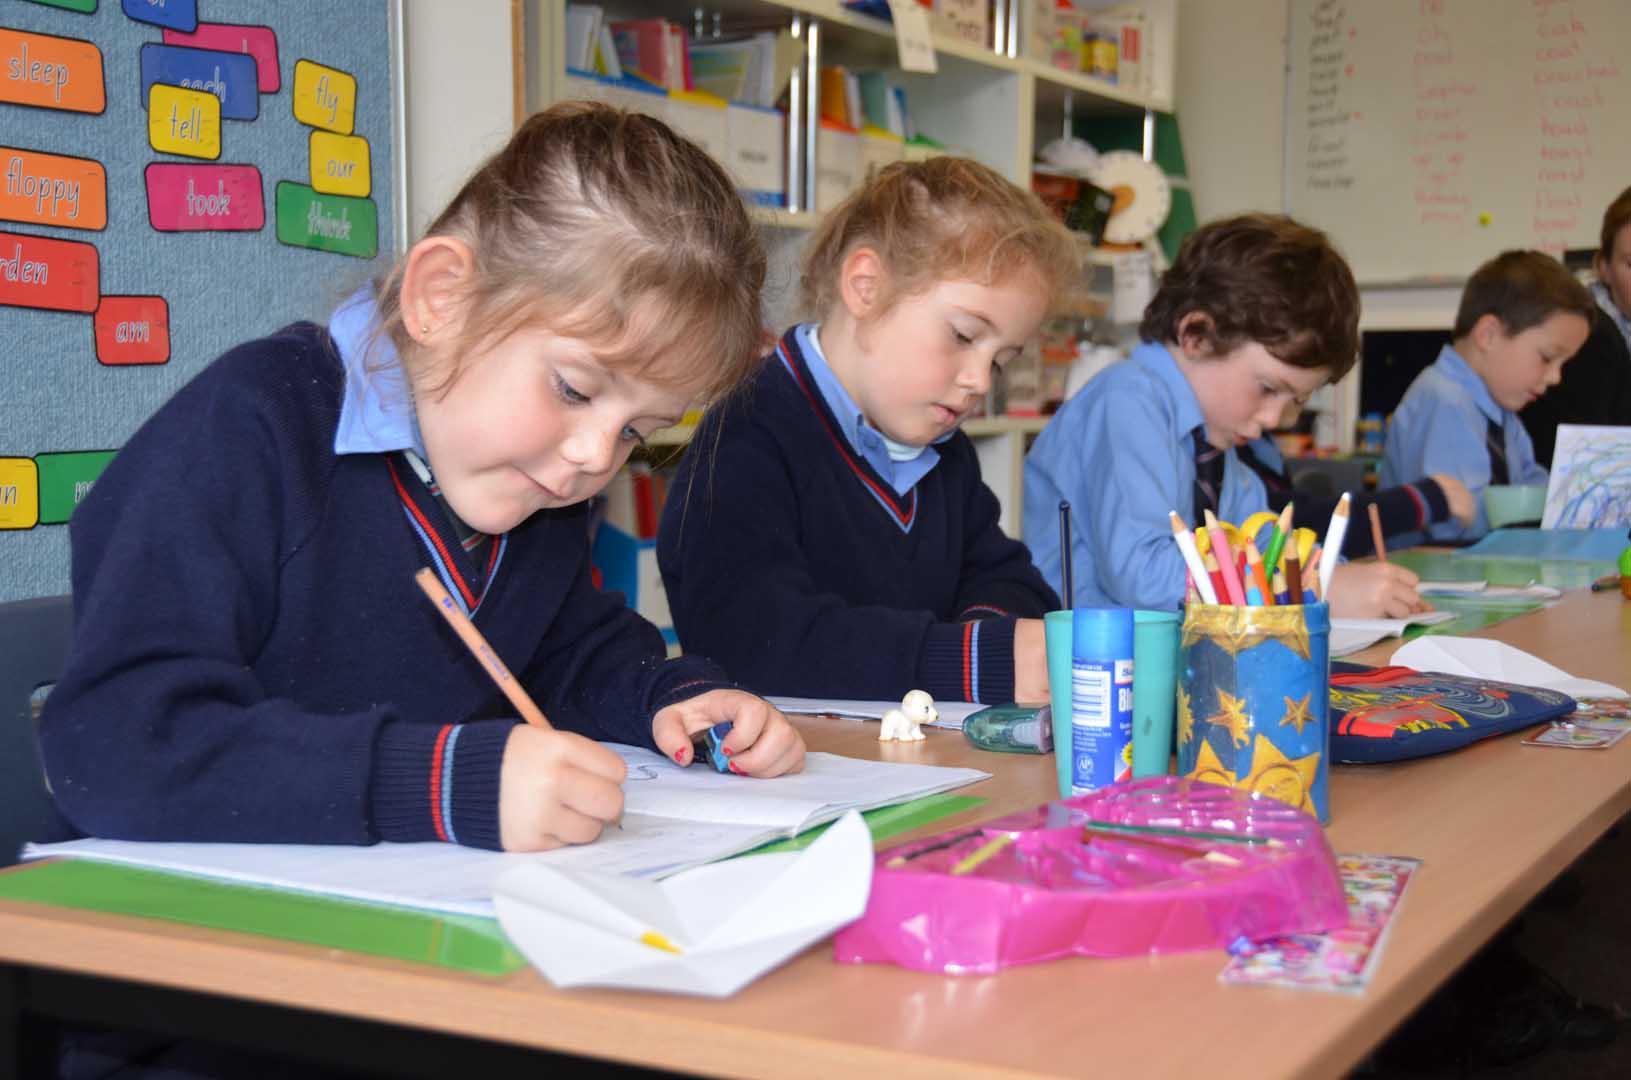 St-Patricks-walcha-classroom3563